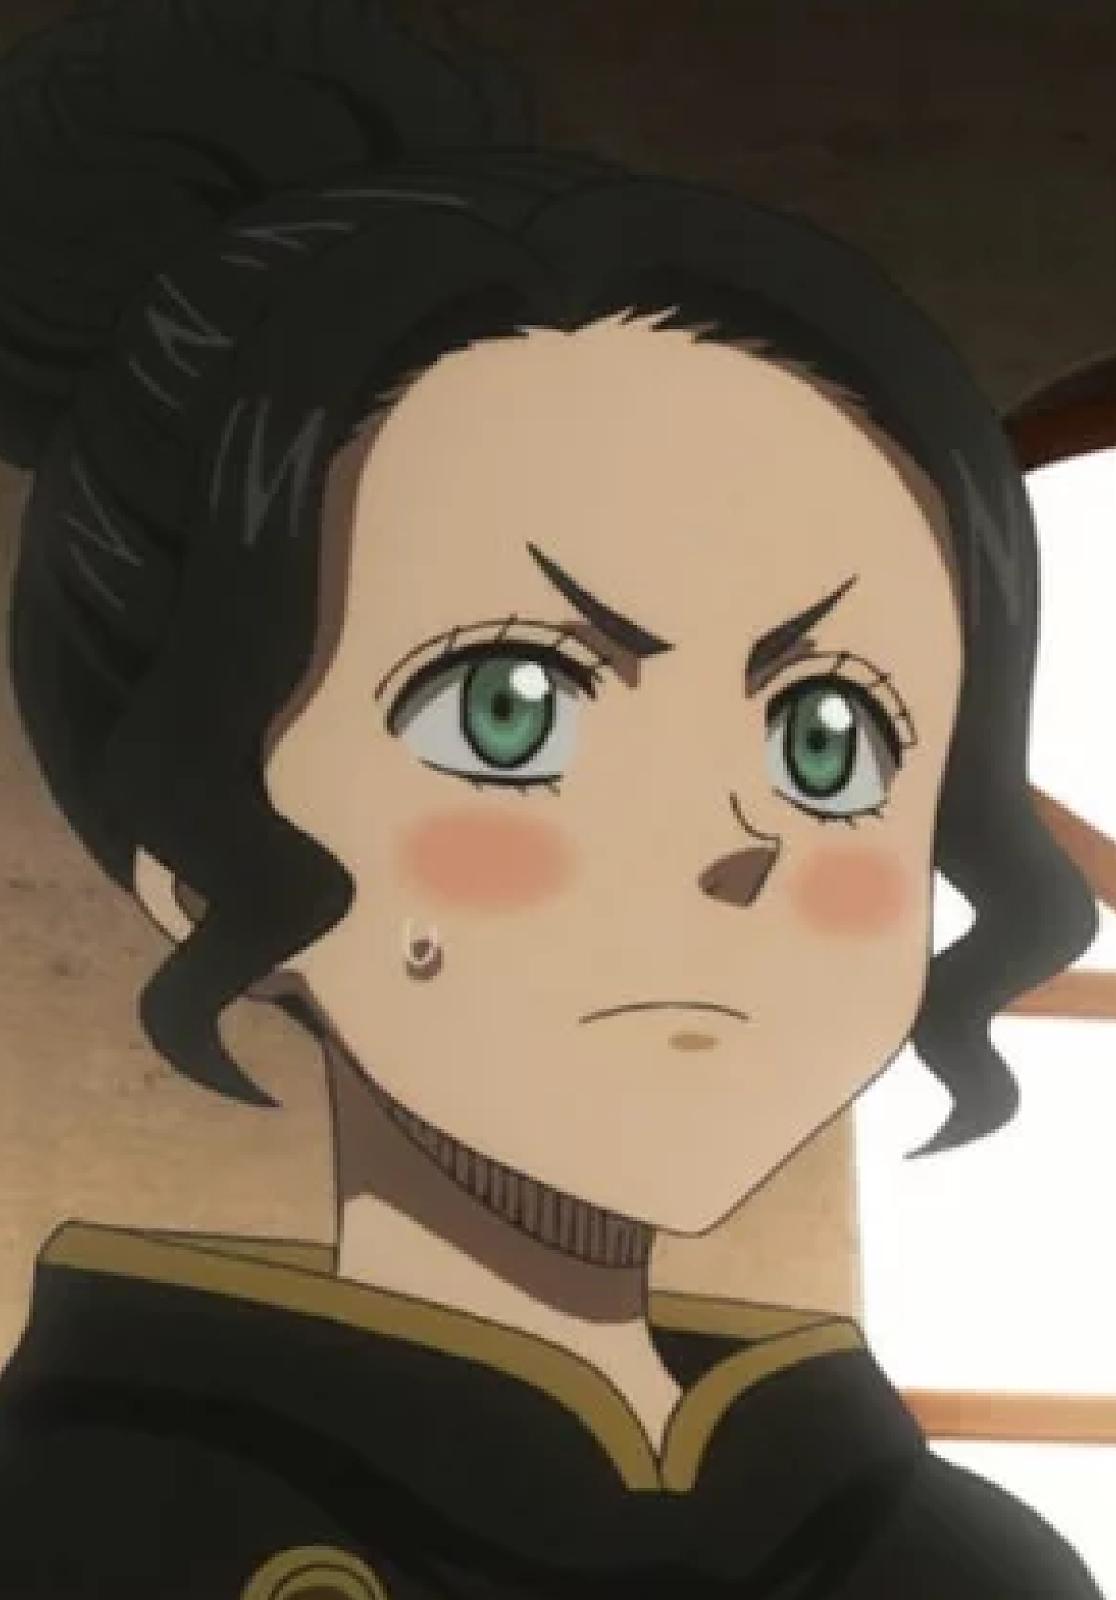 Anime girls feet lover black clover charmy pappitson rematsr